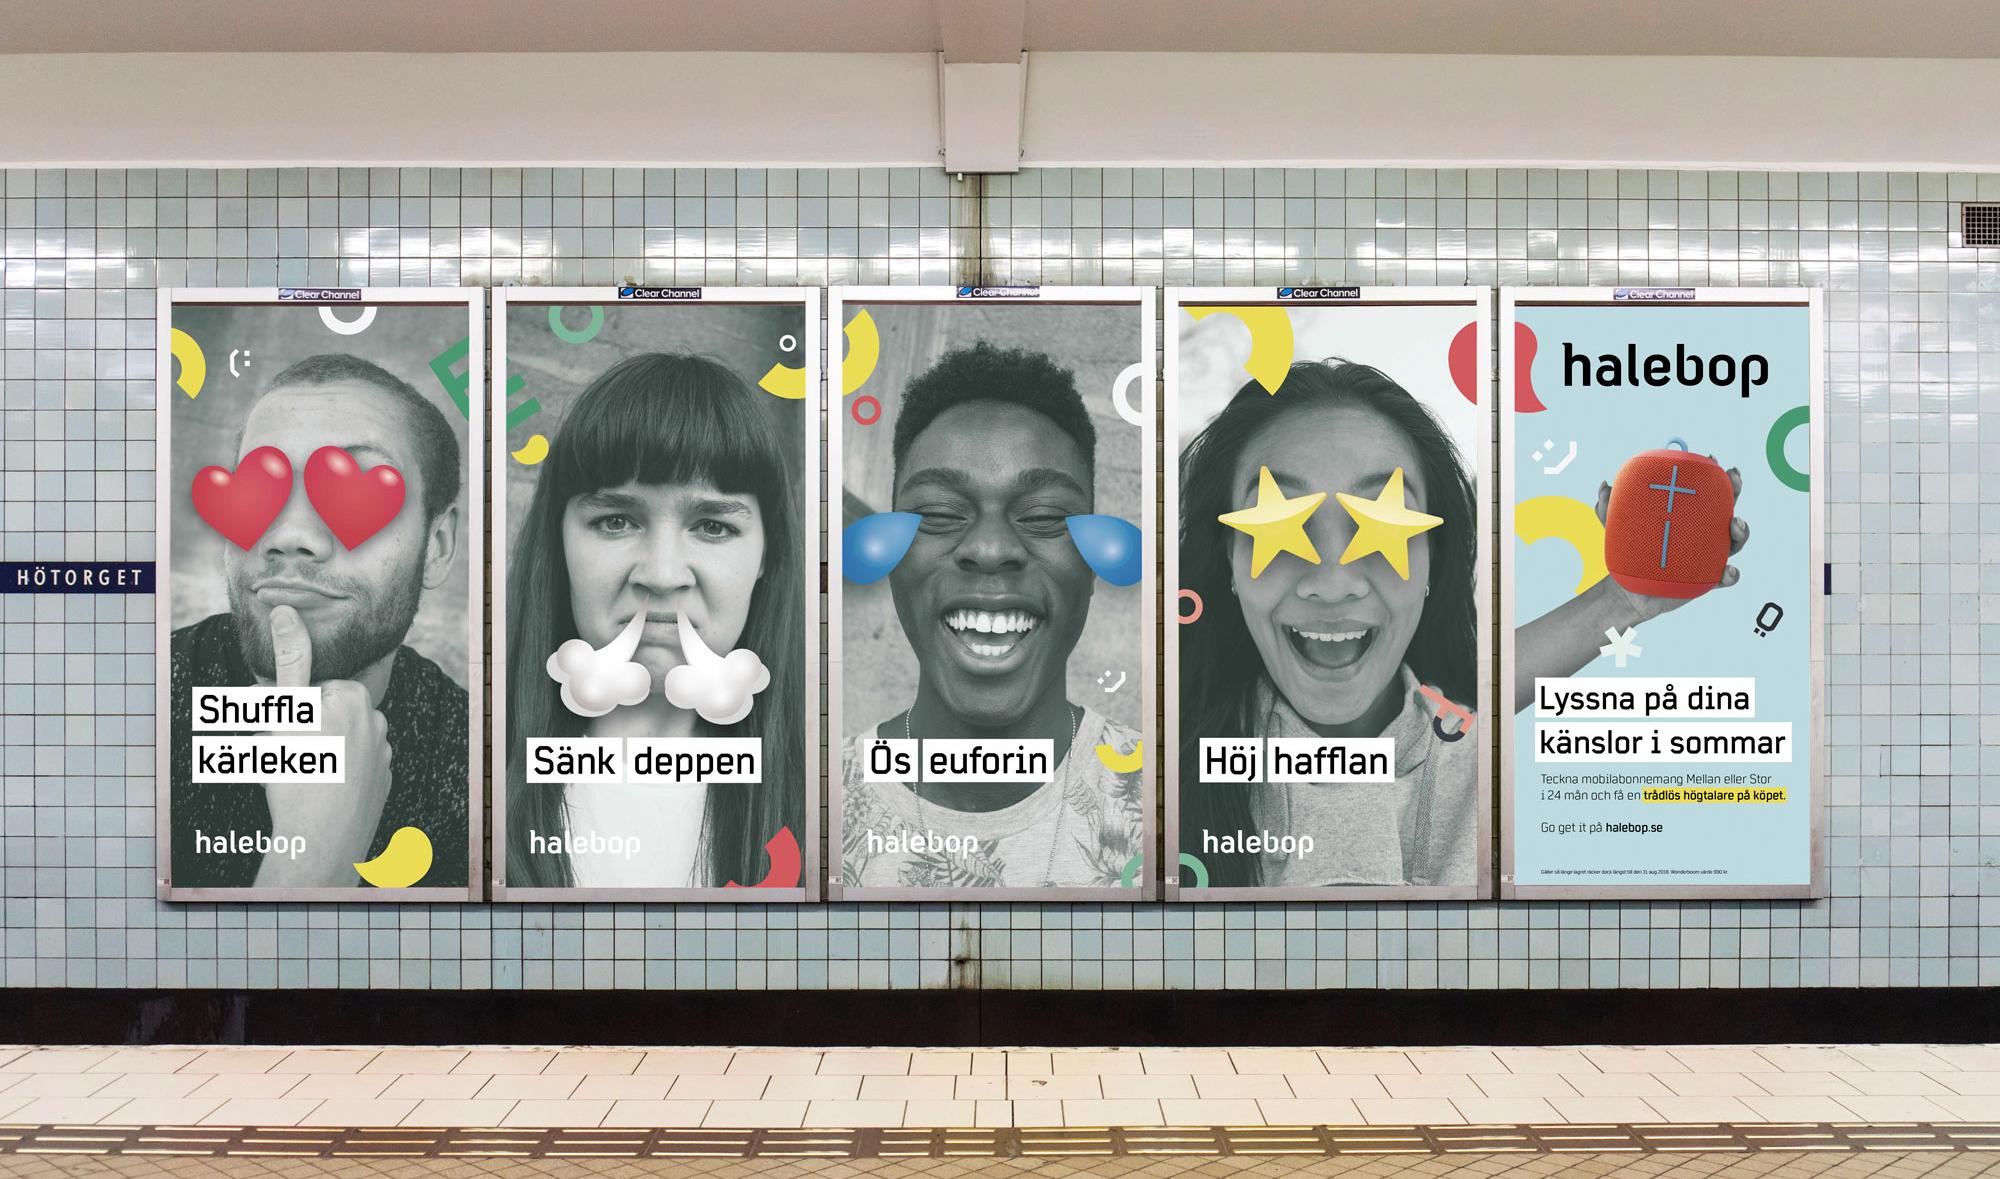 skissbild_Billboard_group_of_5_transit